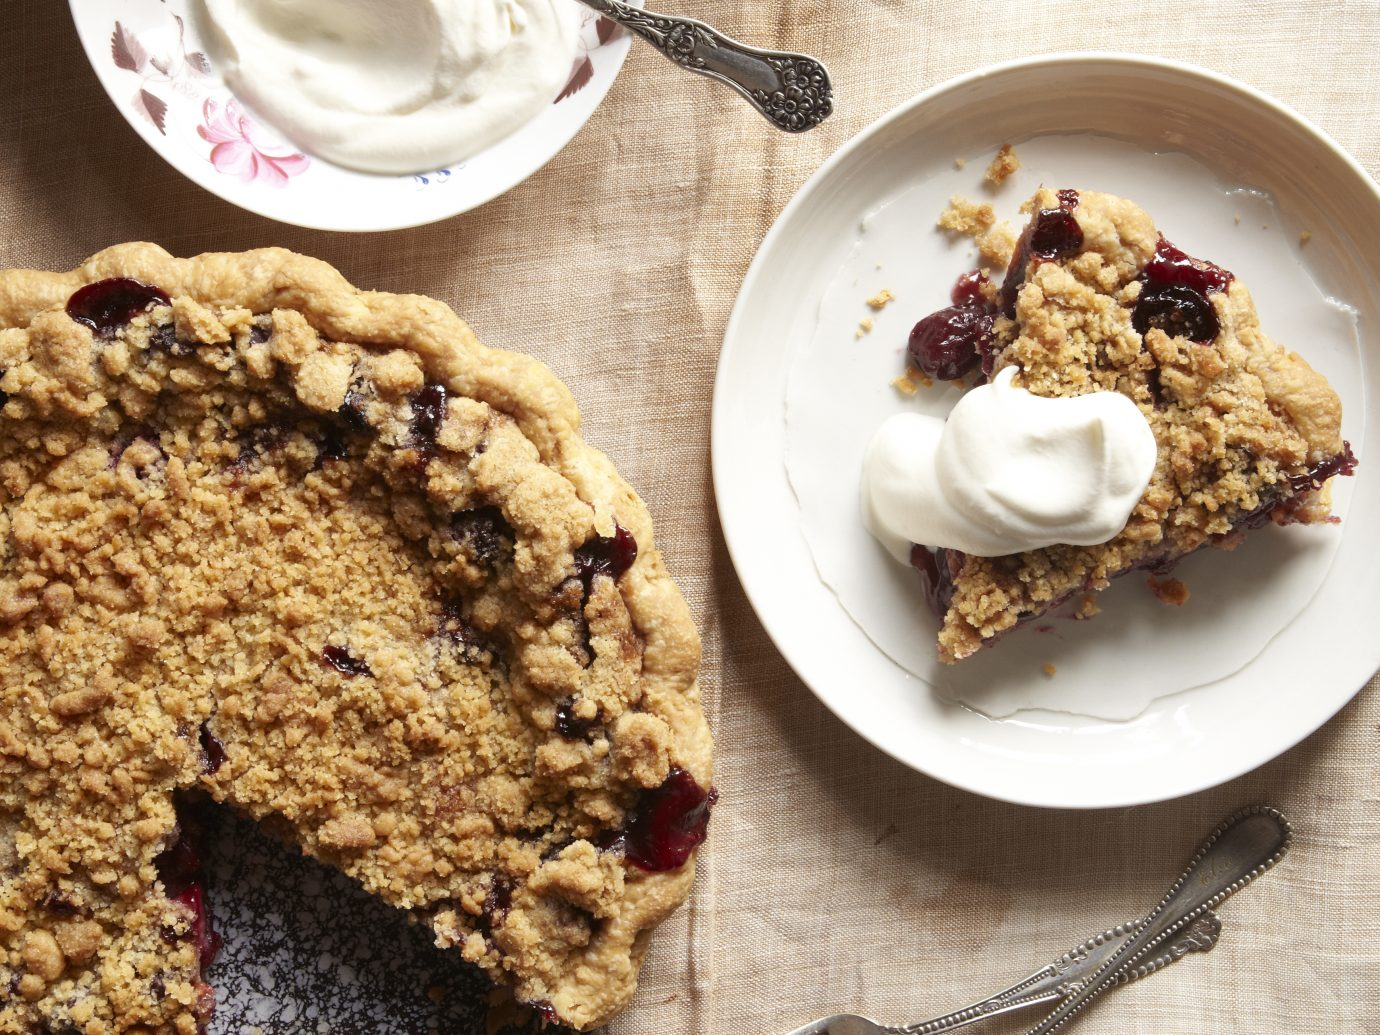 Spead of pies from Four & Twenty Blackbirds